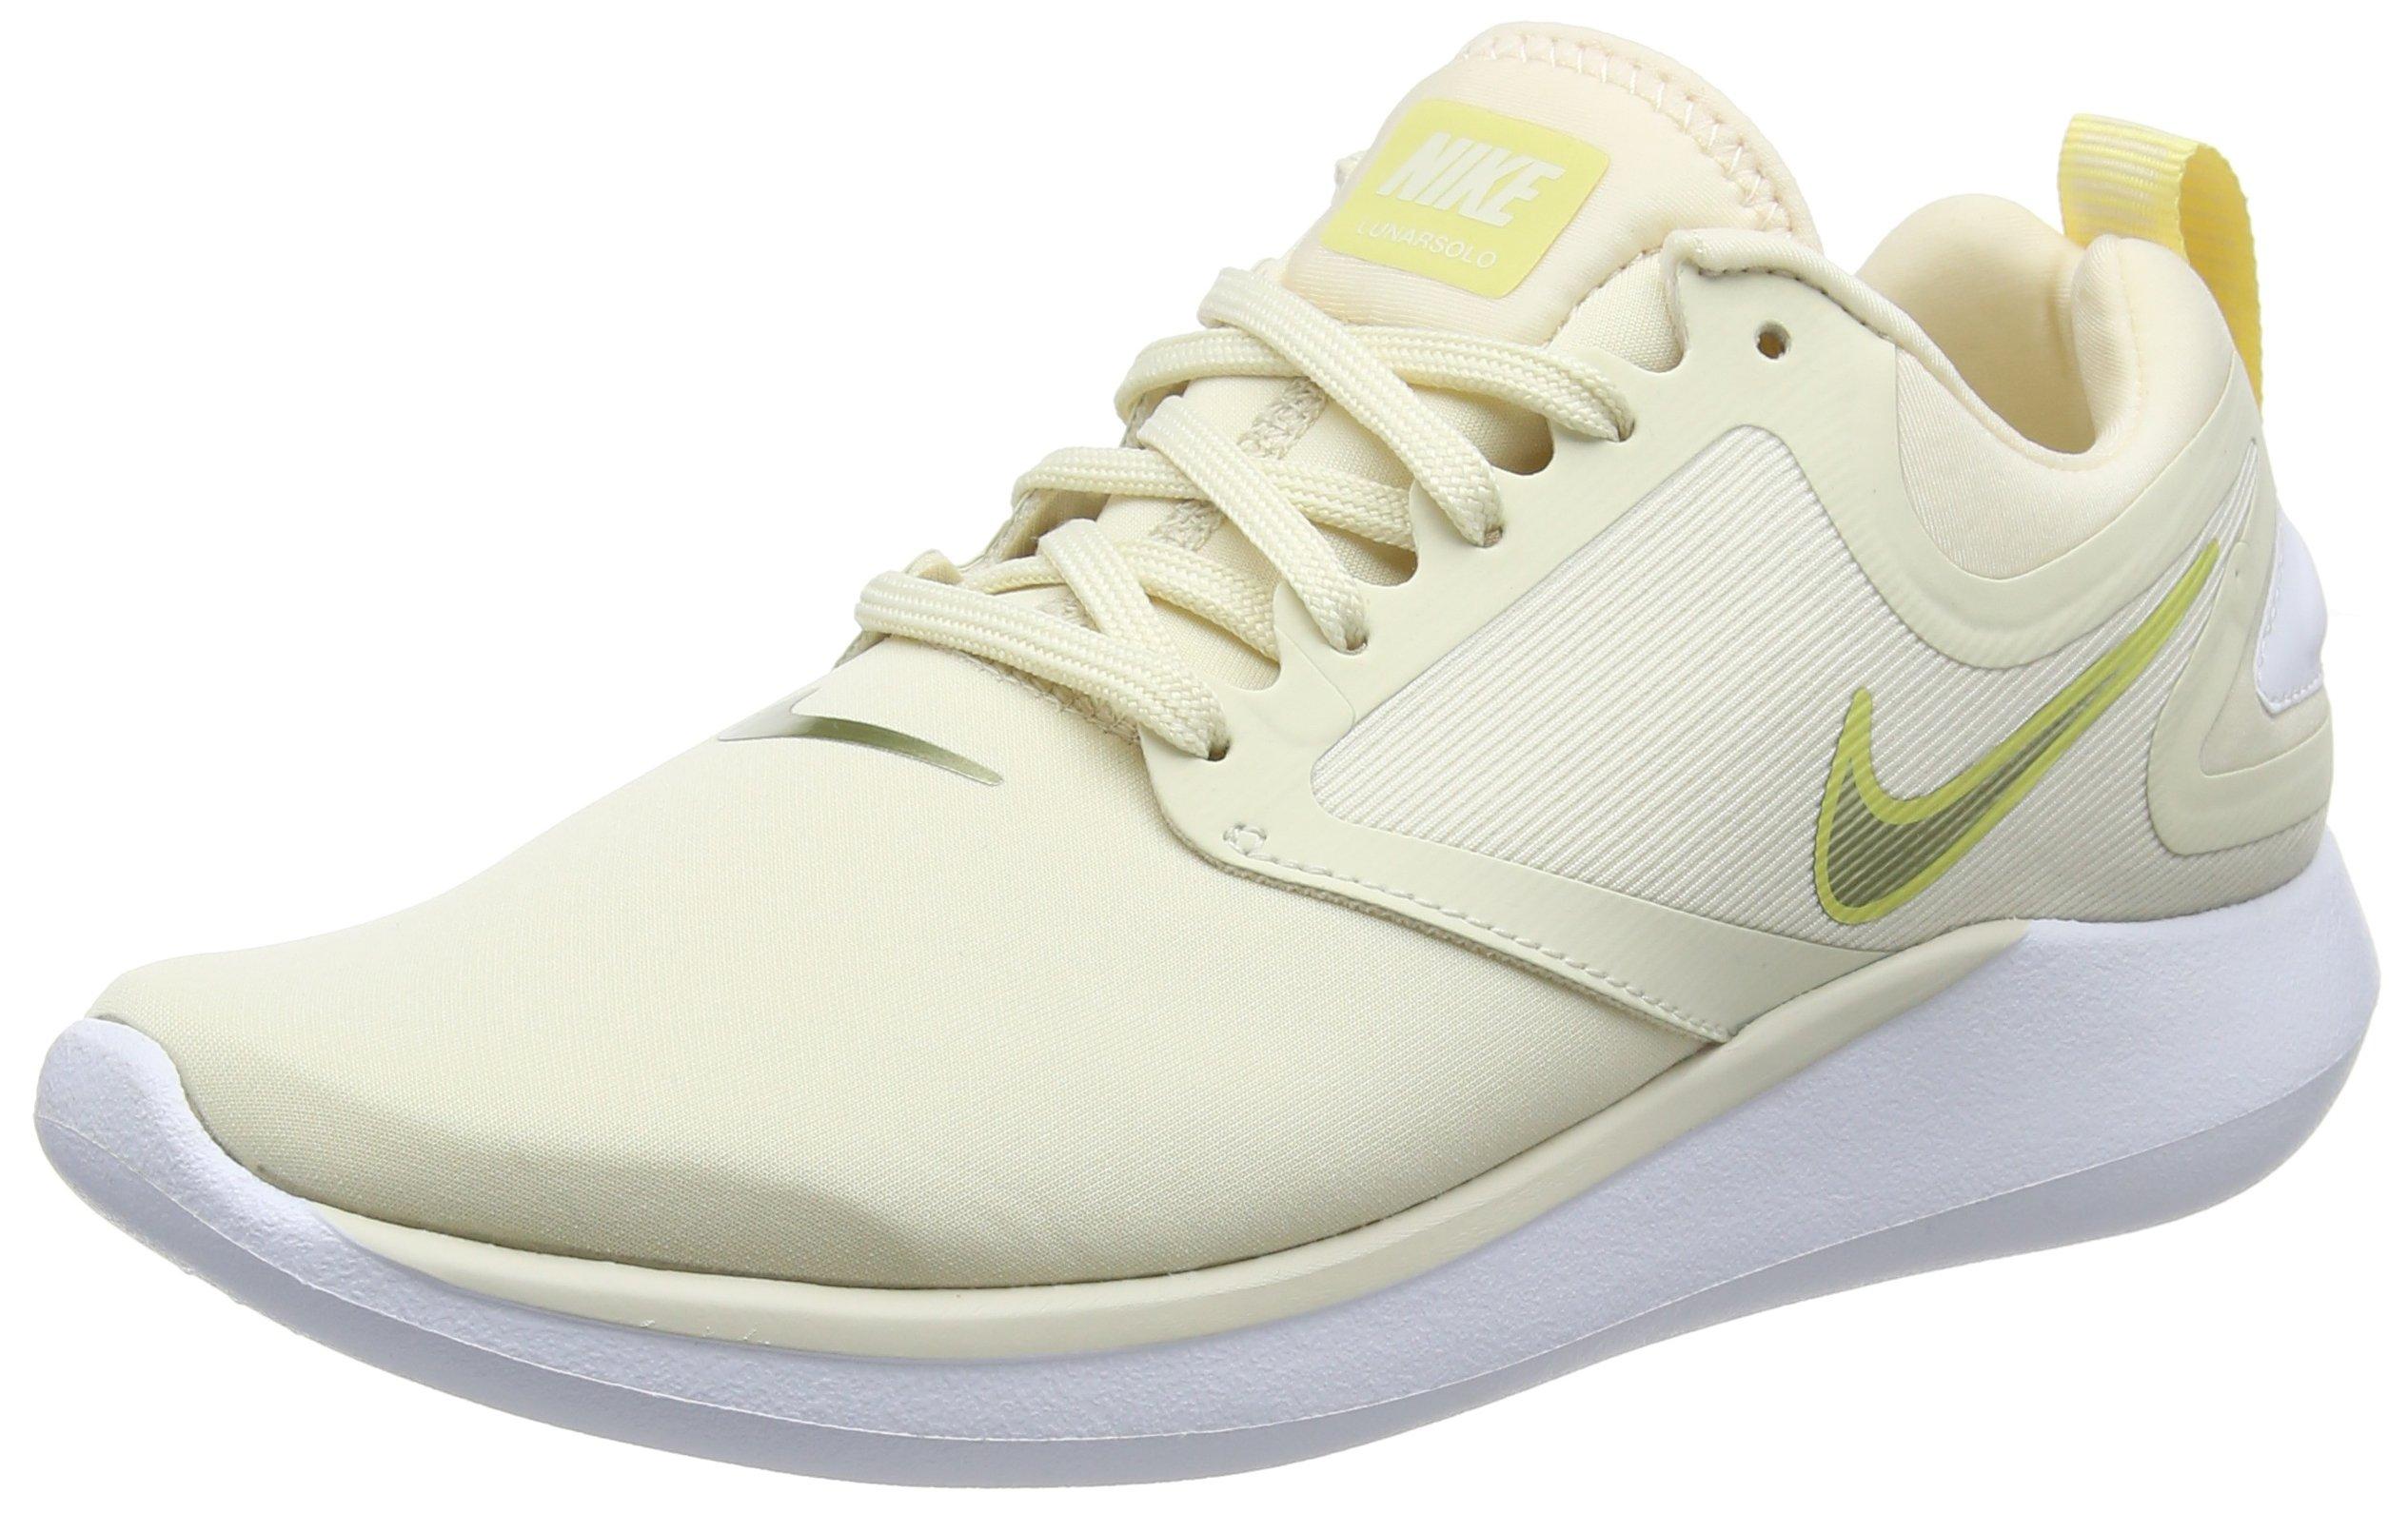 reputable site 4fda5 3691e Galleon - Nike Lunarsolo Womens Running Shoes (7 B(M) US)